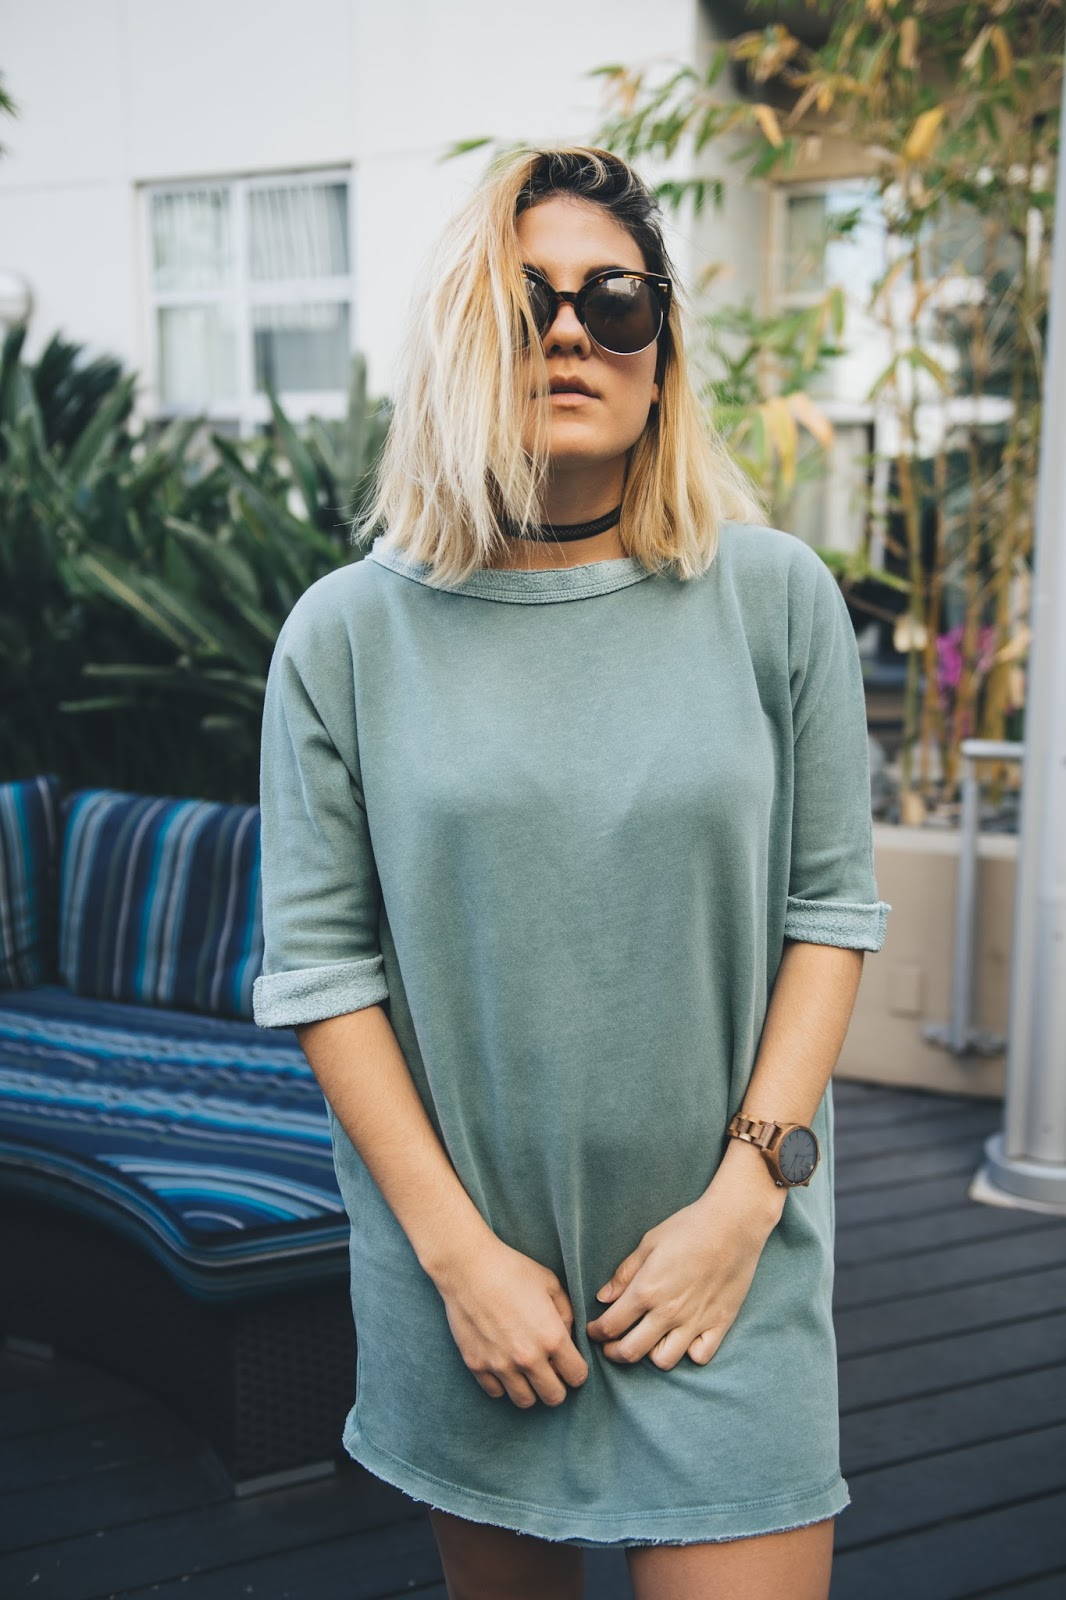 Urban Outfitters Dress - Fashion Blogger Taylor Winkelmeyer